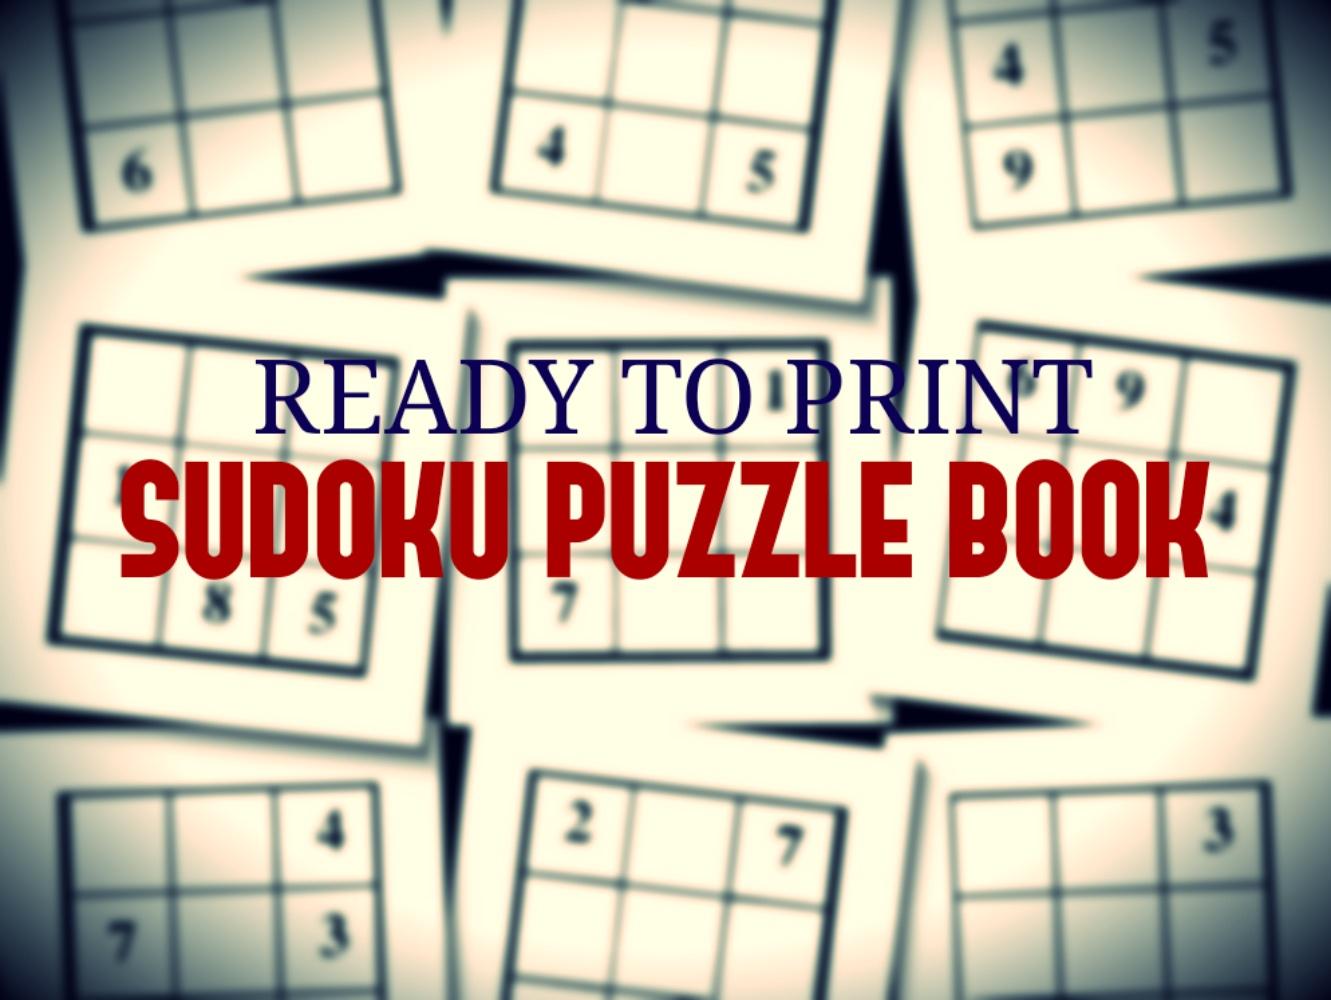 Print Ready Sudoku Puzzle Book Vol 143 pour Sudoku A Imprimer